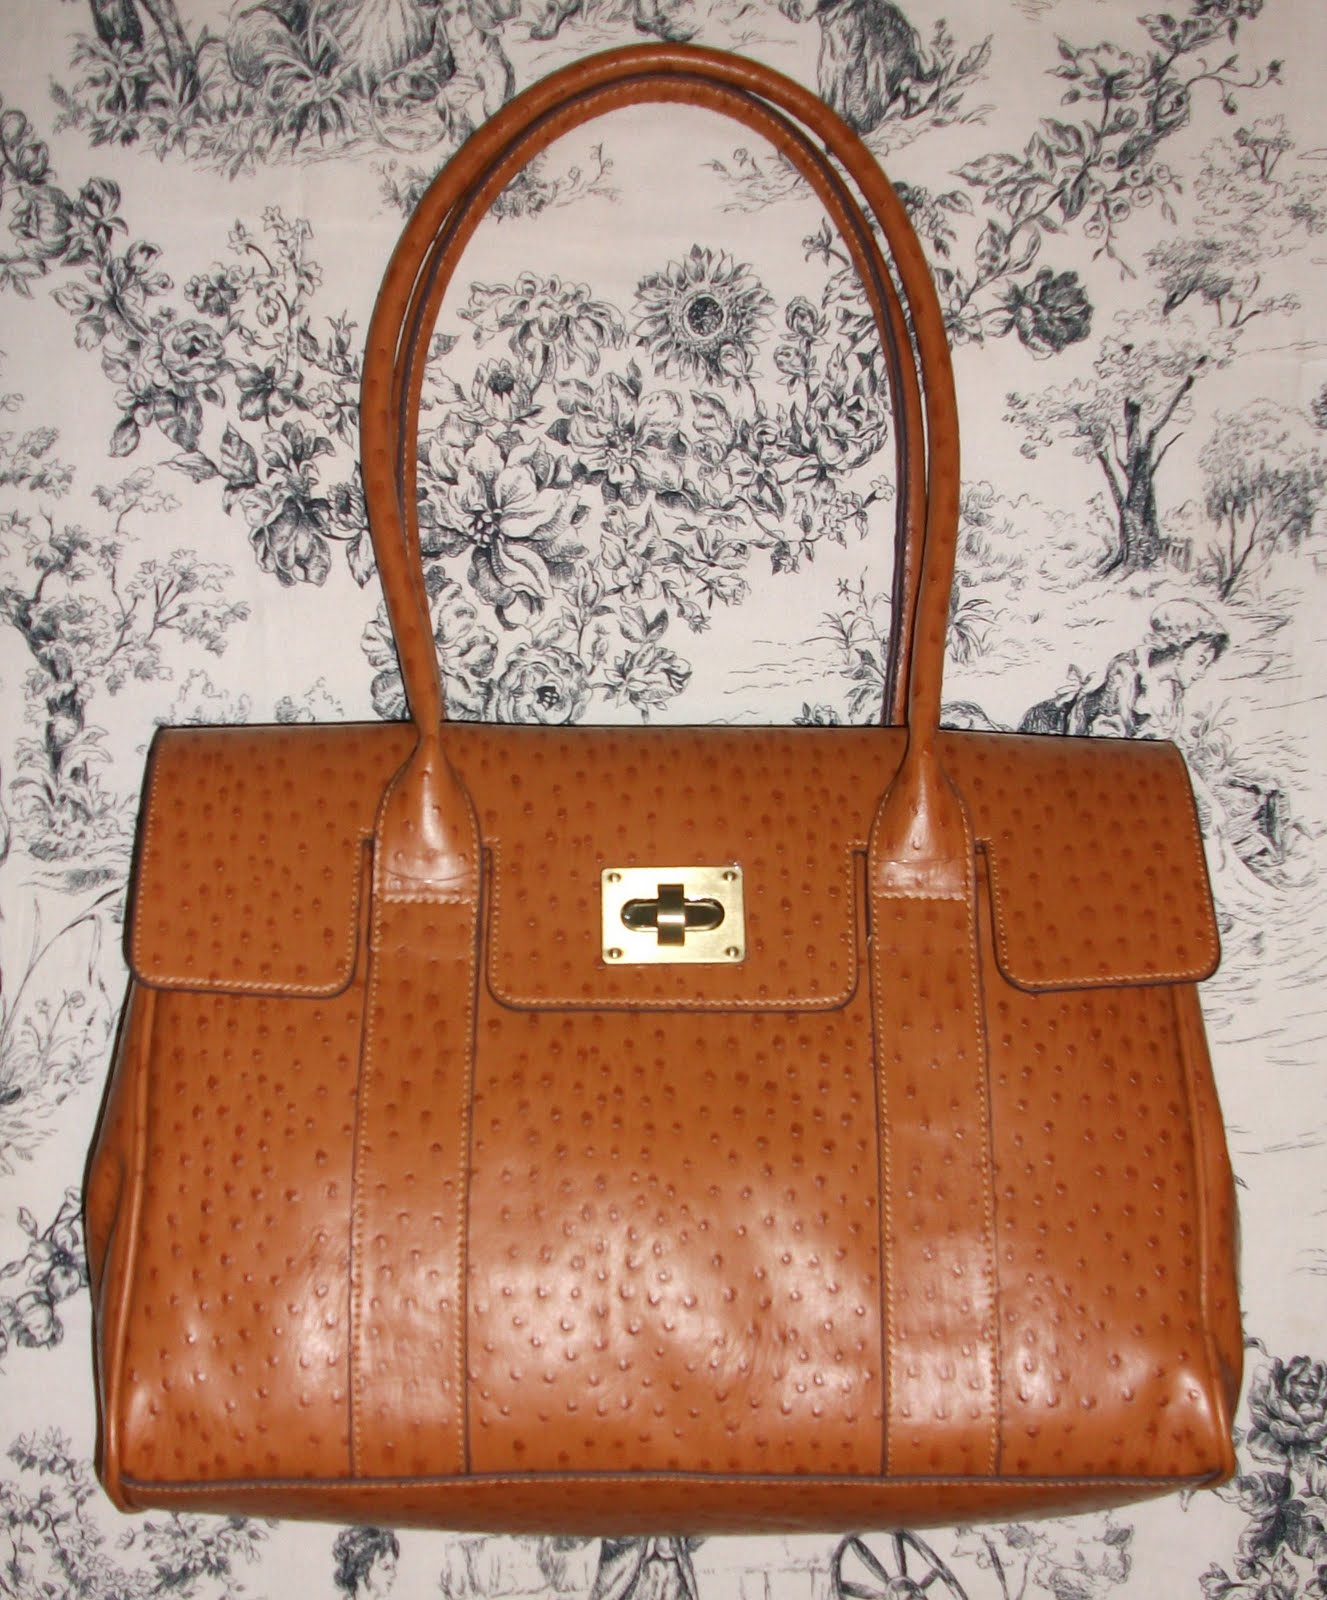 Homegoods Com Online Shopping: Tj Maxx Floral Leather Handbags